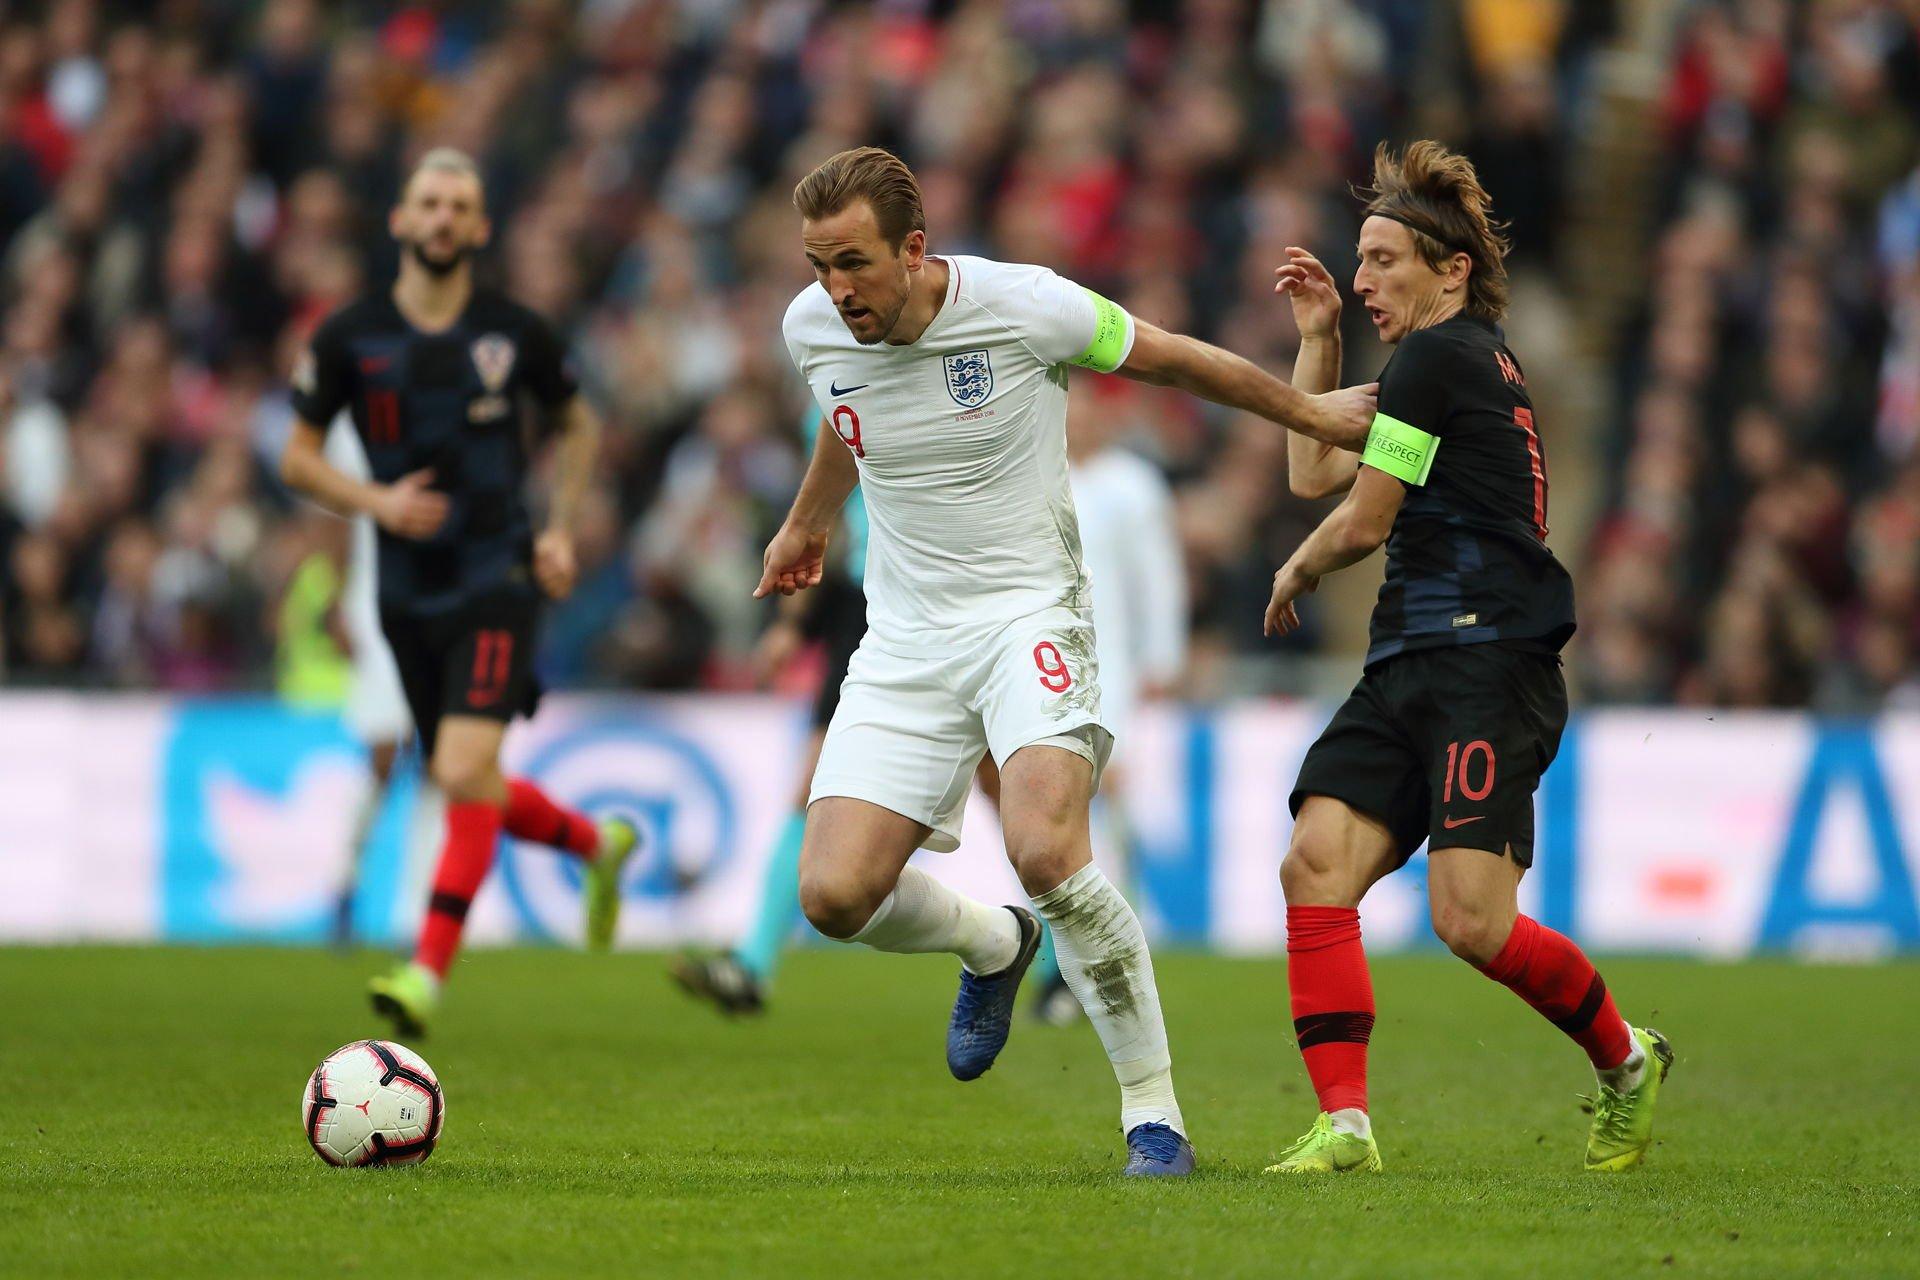 Harry Kane and Luka Modric will lock horns on Sunday